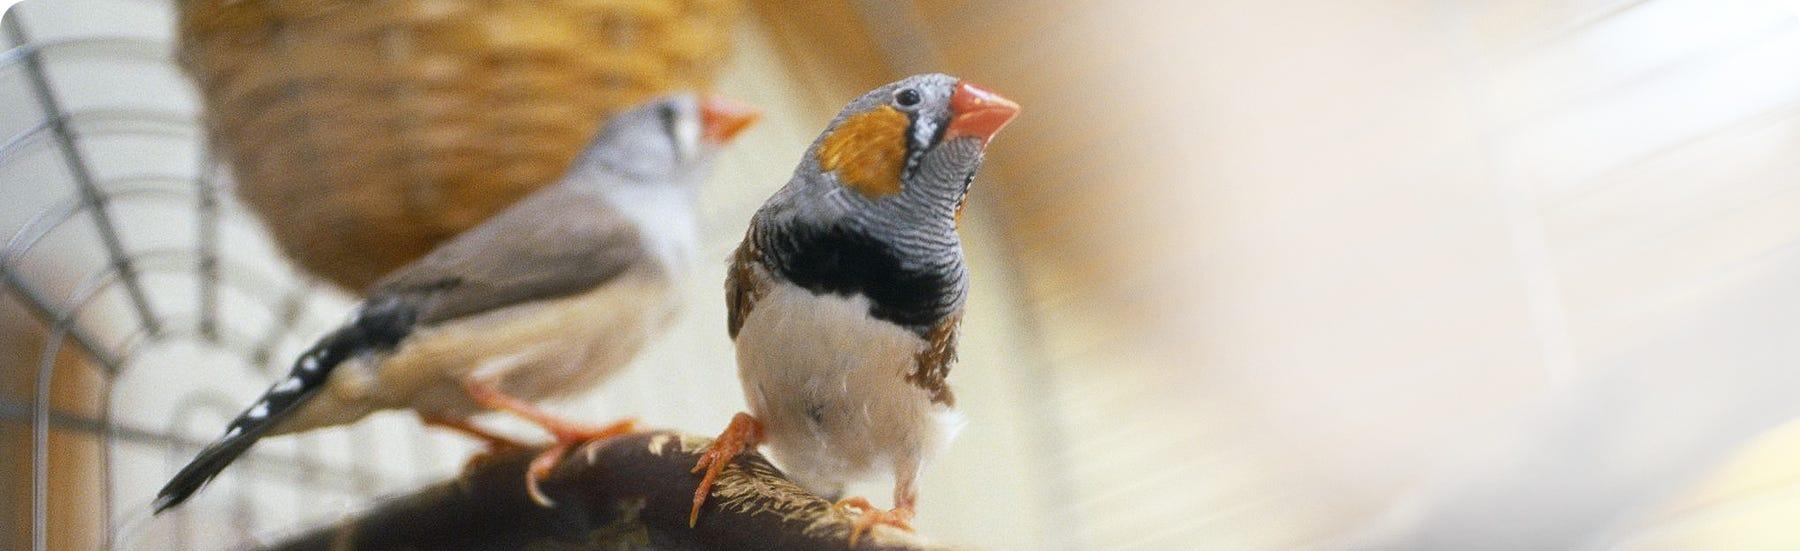 Cage bird food